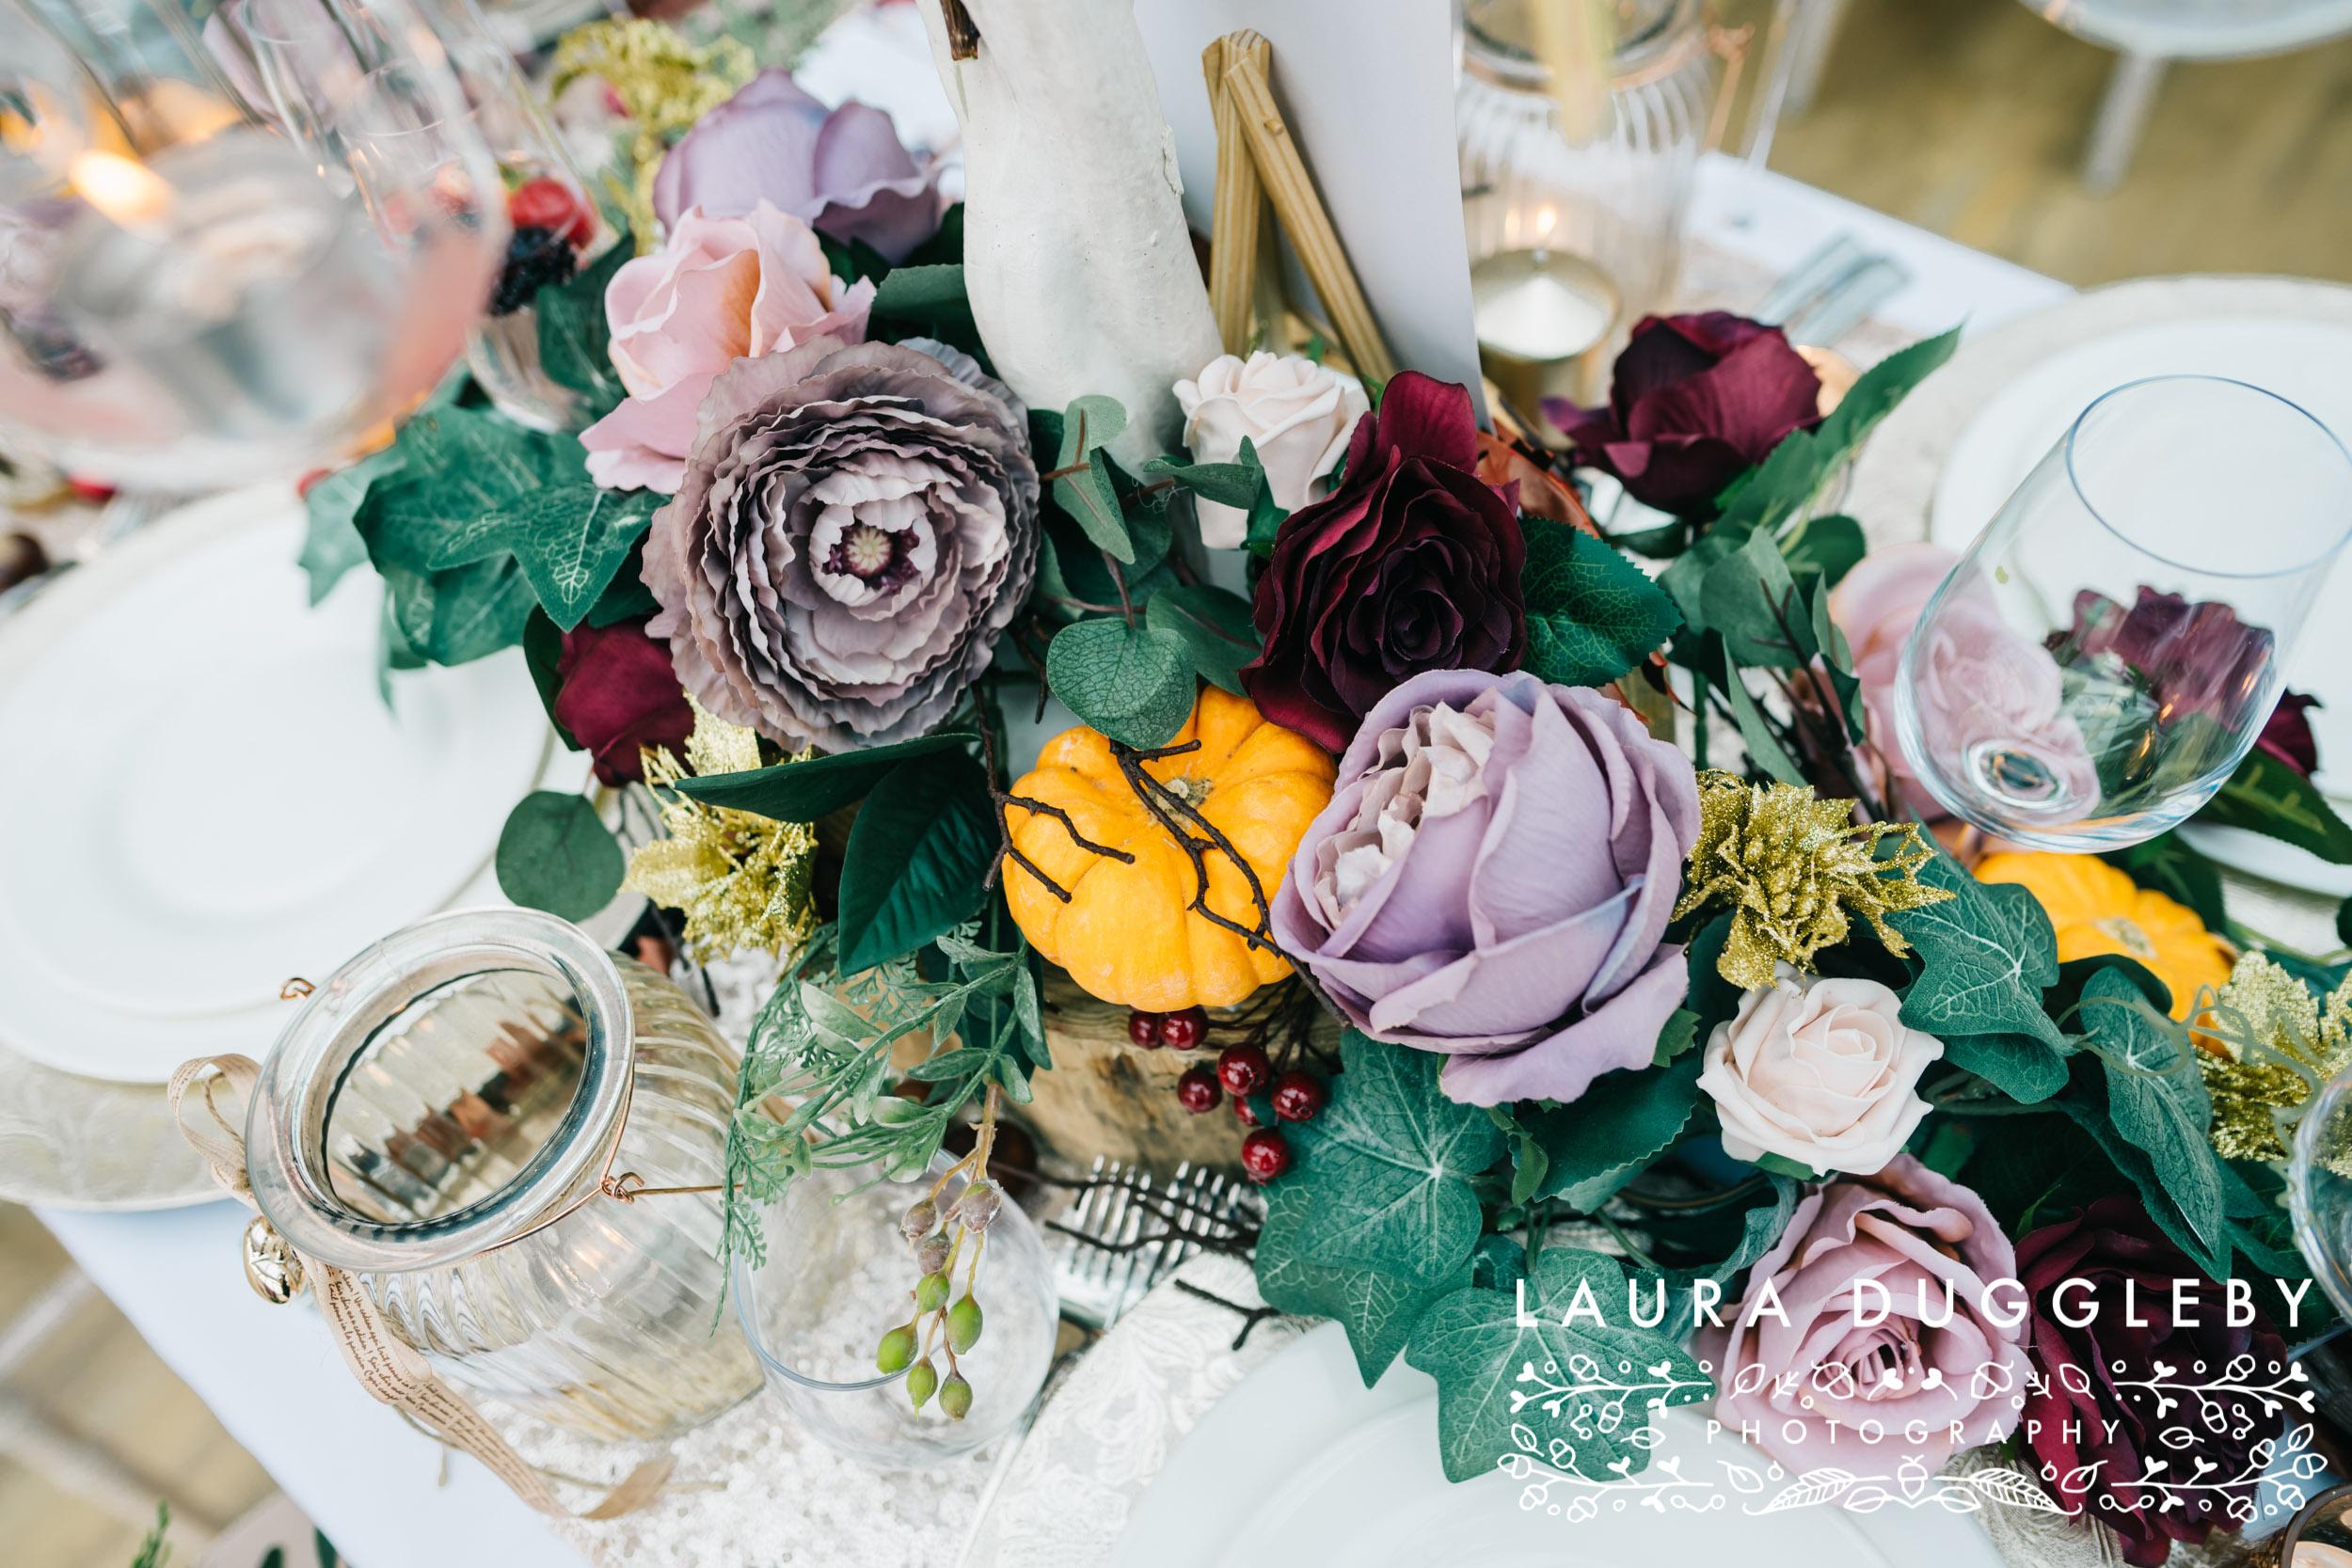 Thornton Hall Country Park Wedding Photographer-90.jpg